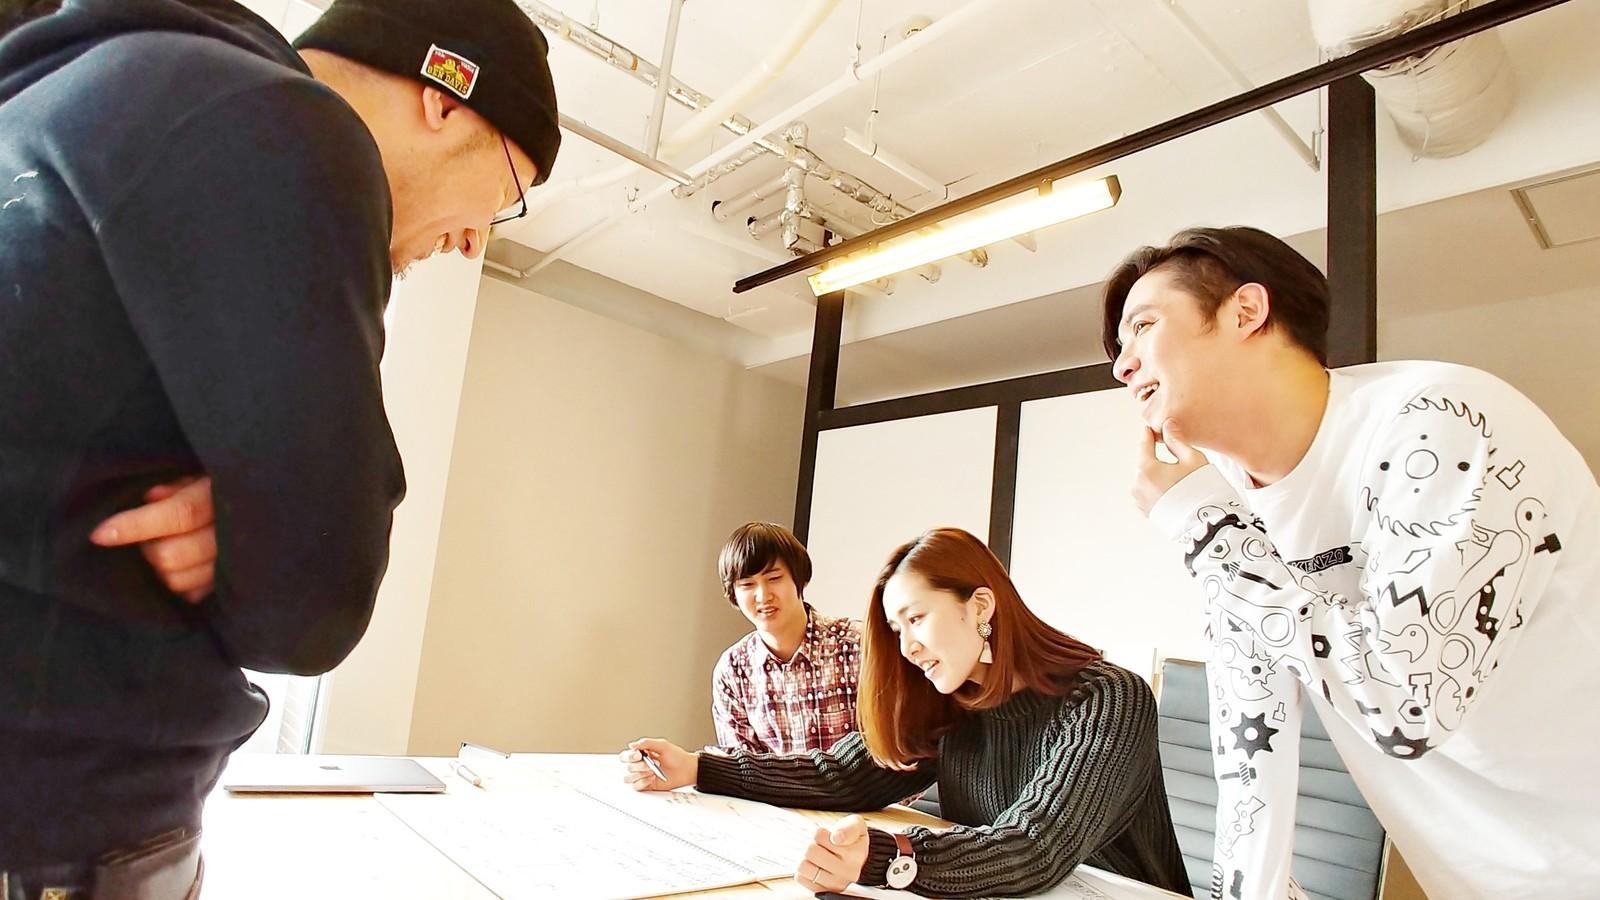 Goで自社サービスを開発したいエンジニア募集 |人事評価クラウド『HRBrain』事業拡大